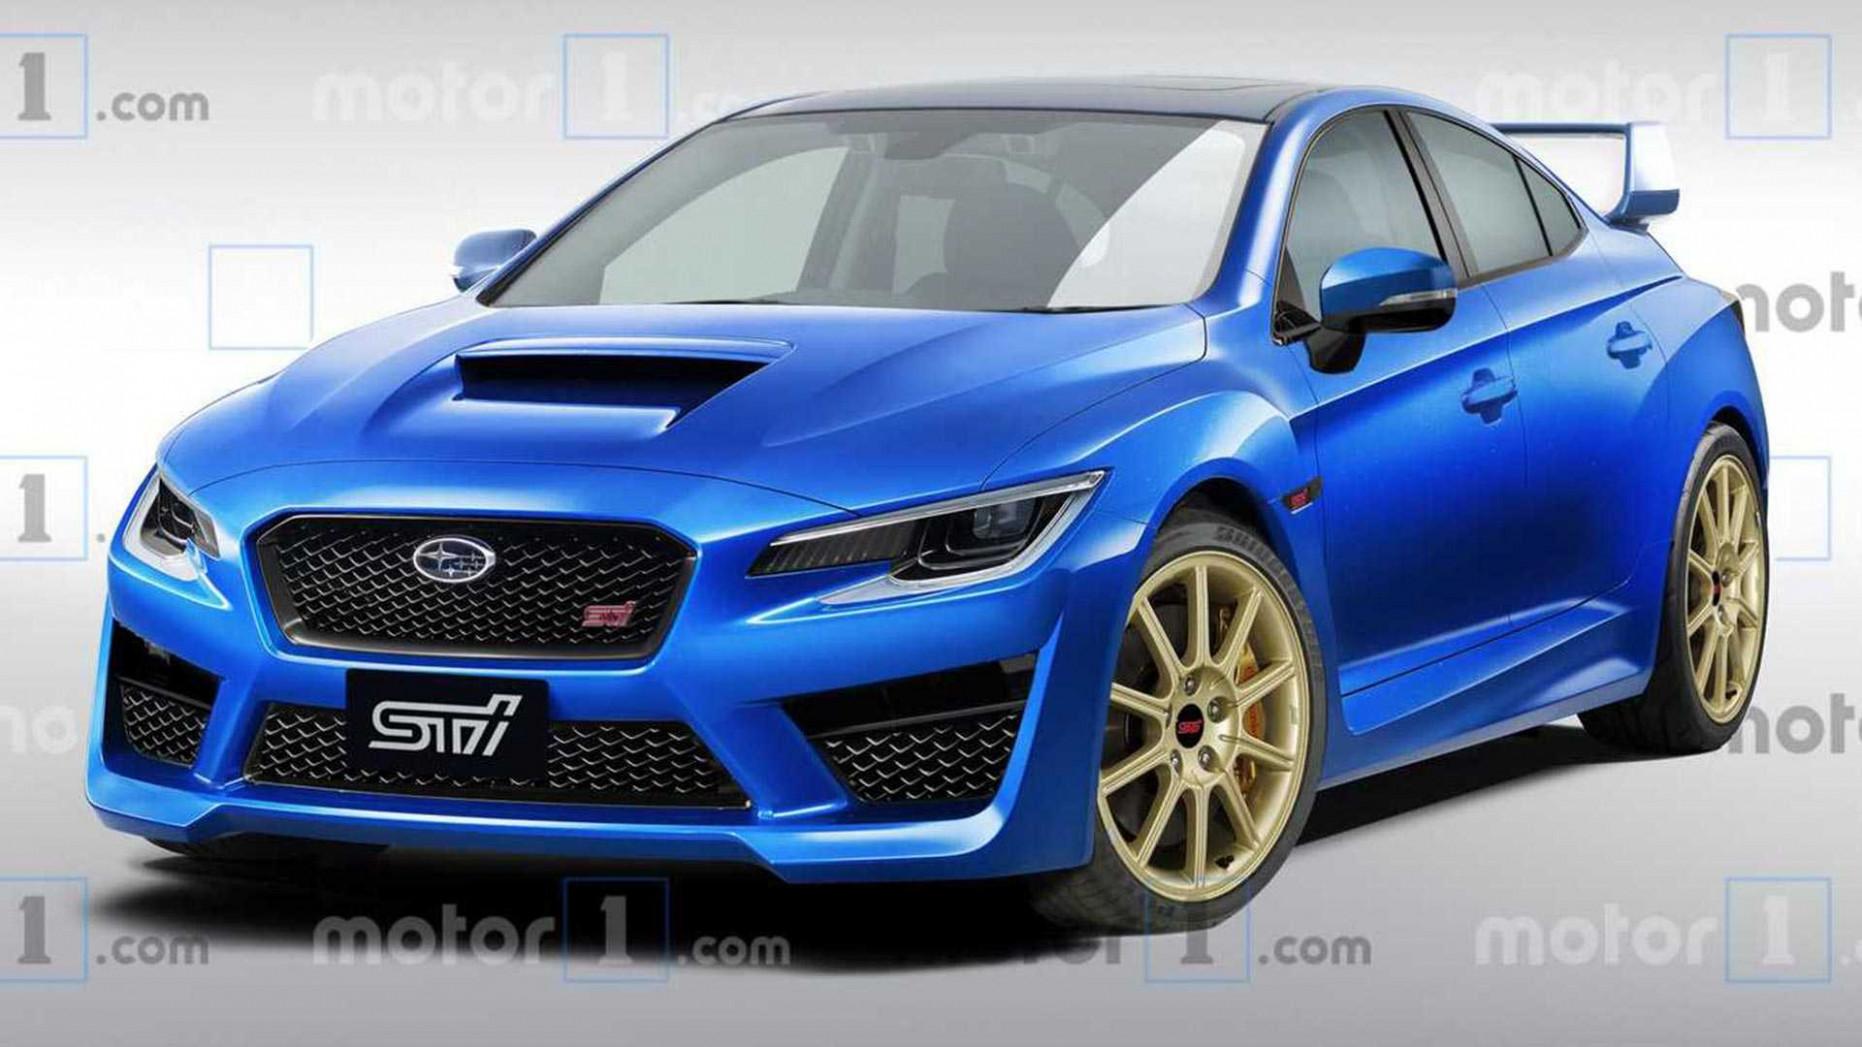 Picture 2022 Subaru Sti Release Date